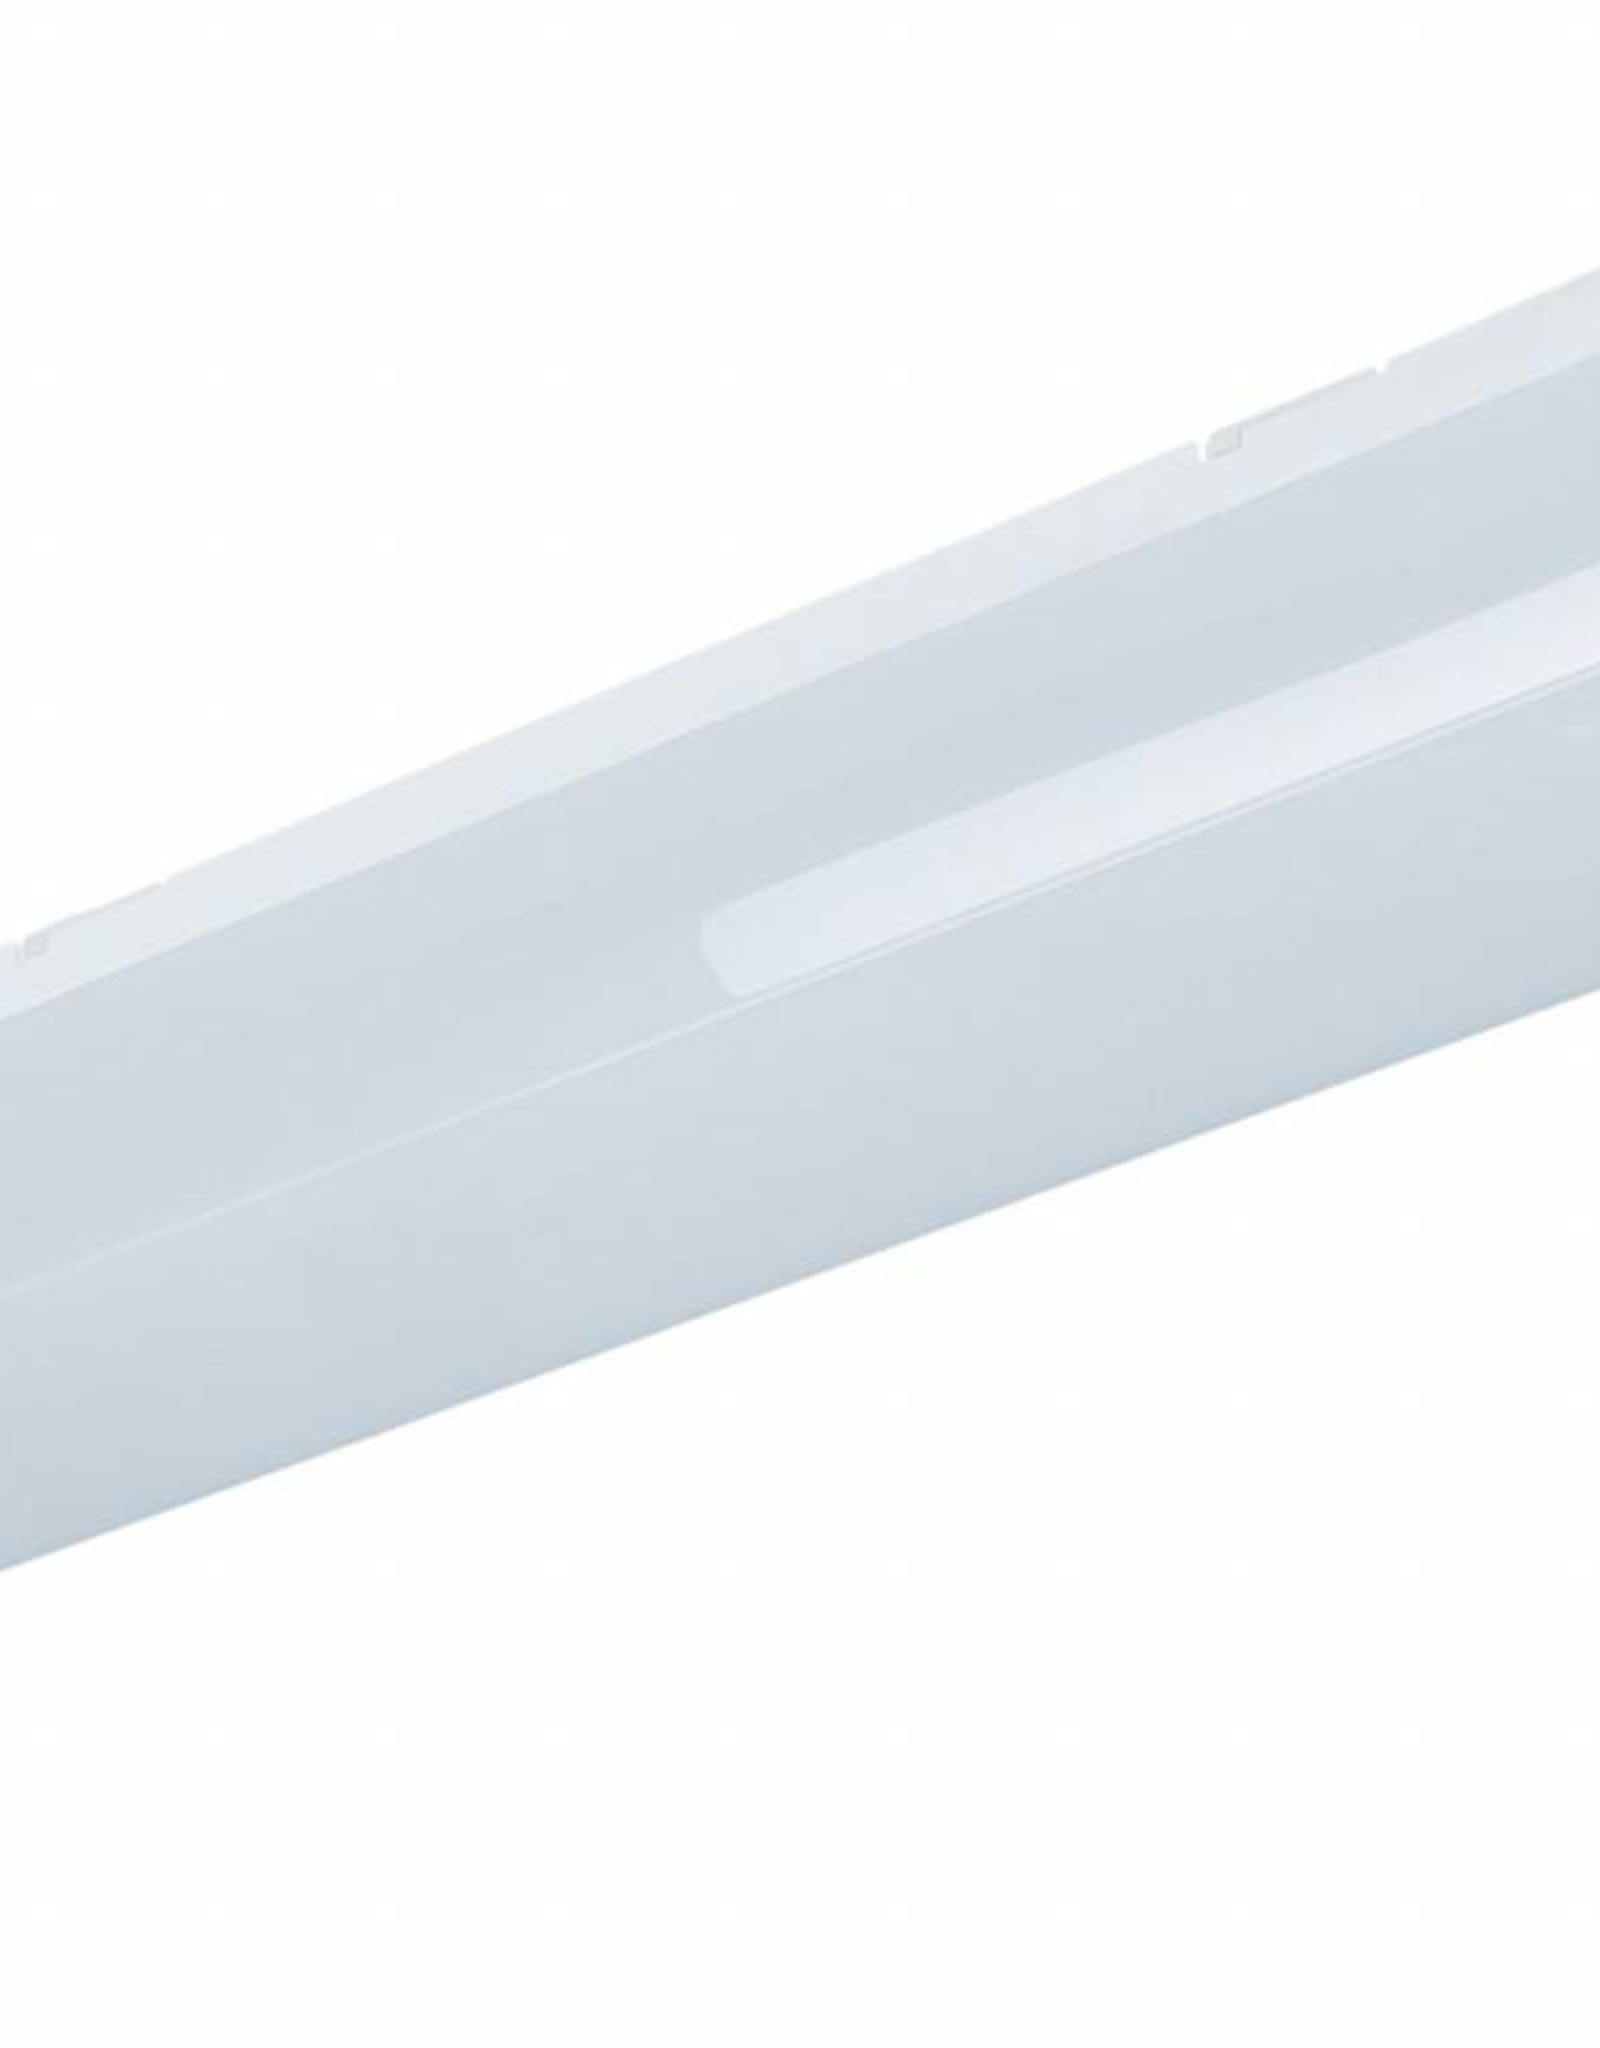 Linea 2.4ft 8800/840 DALI M1h